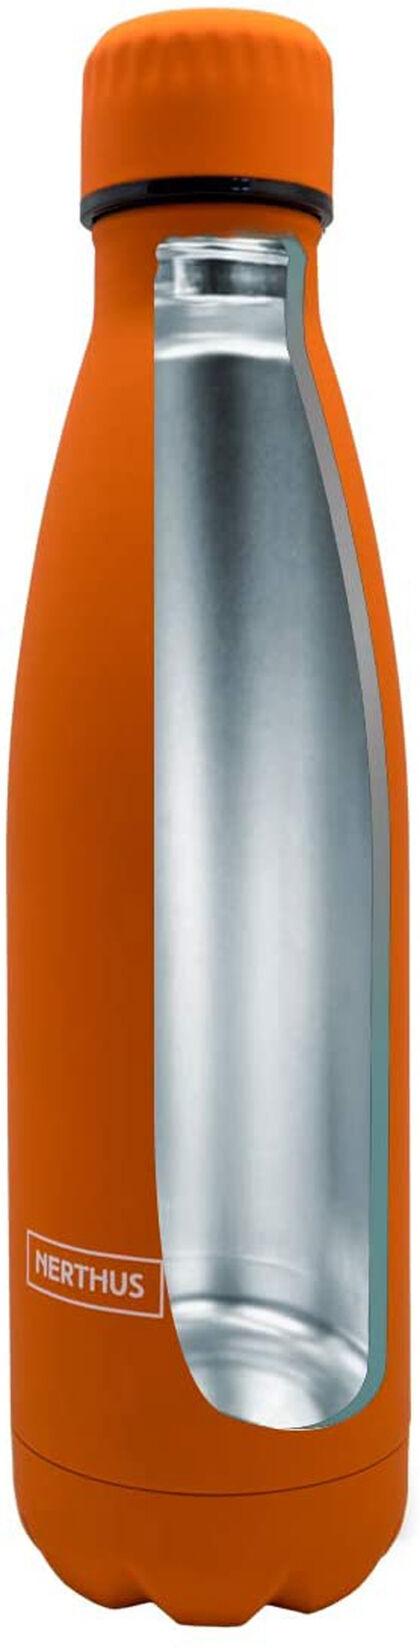 Botella Nerthus Doble capa 500 ml Naranja